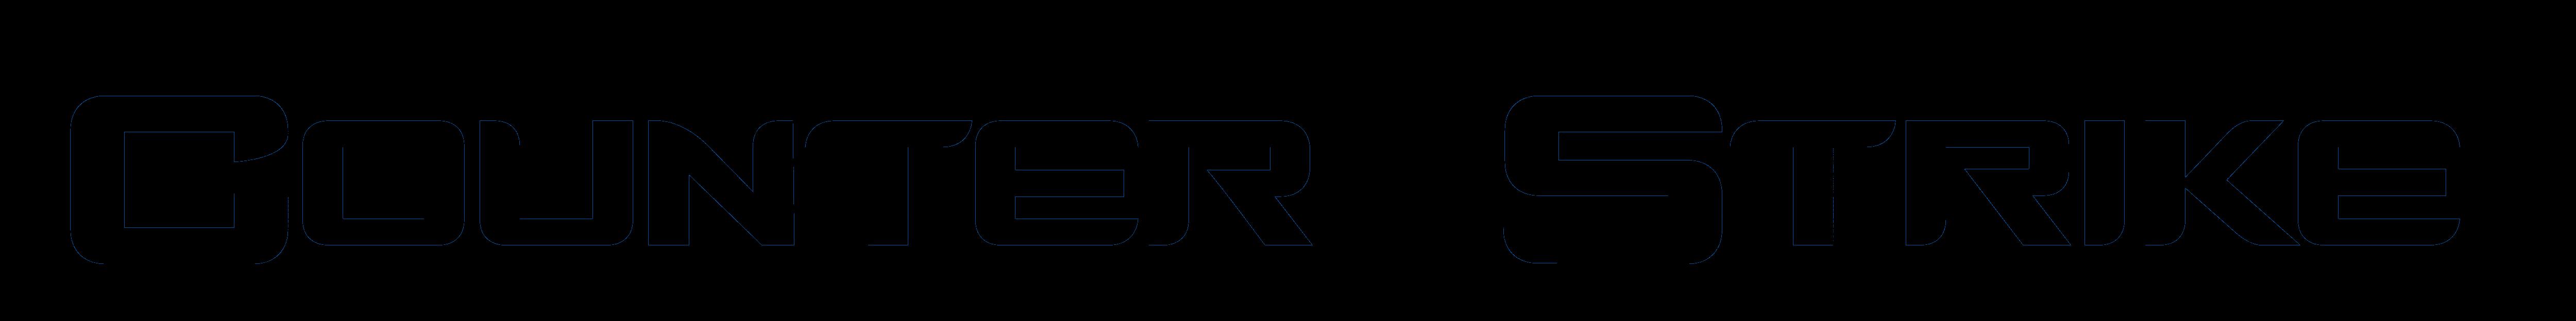 Counter Strike 16 Logo Wwwpixsharkcom Images